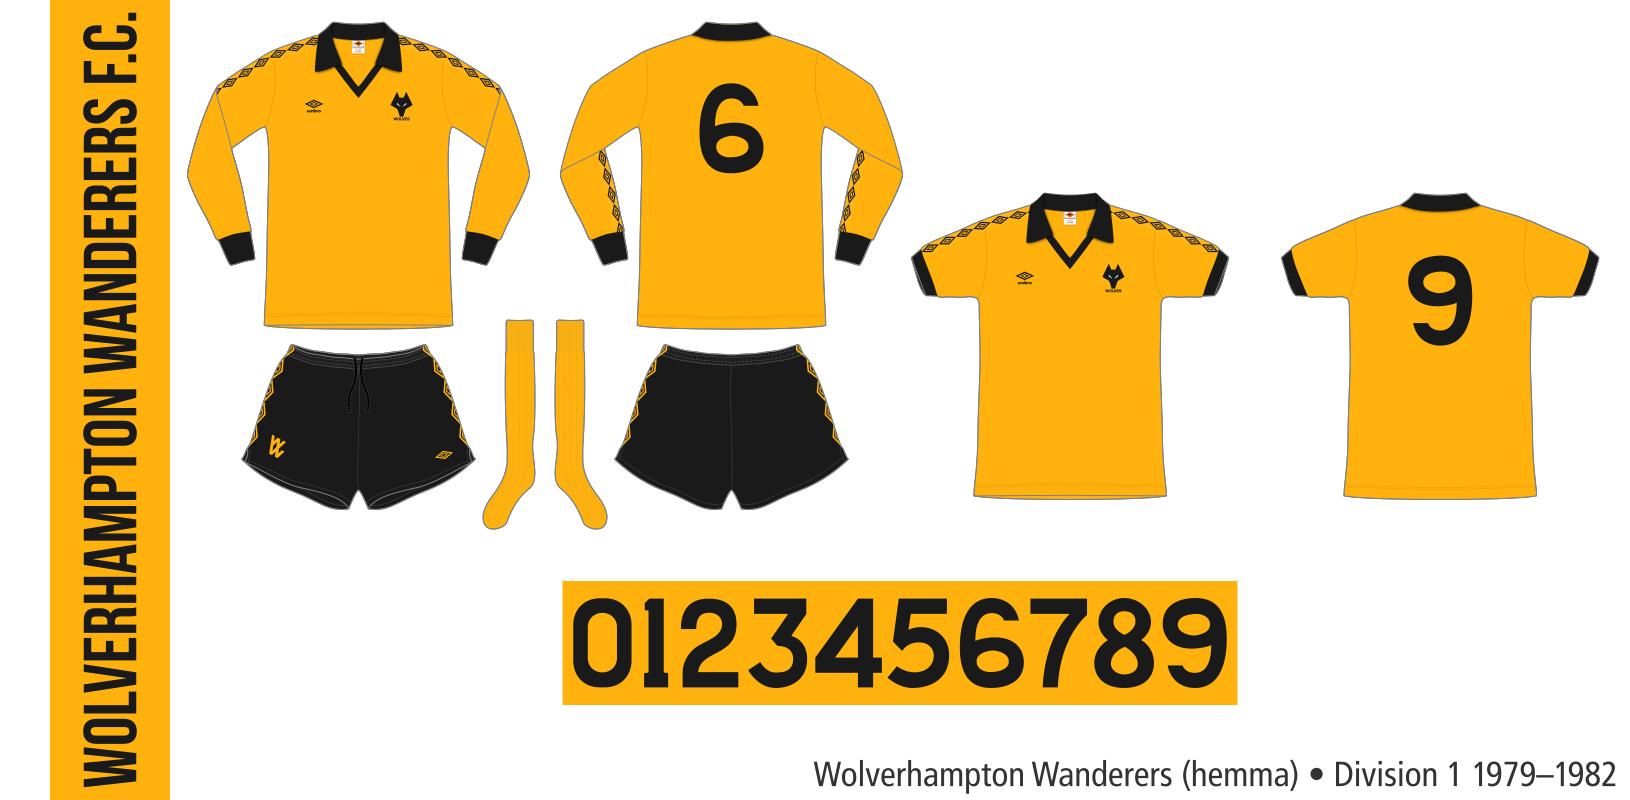 Wolverhampton Wanderers 1979–1982 (hemma)